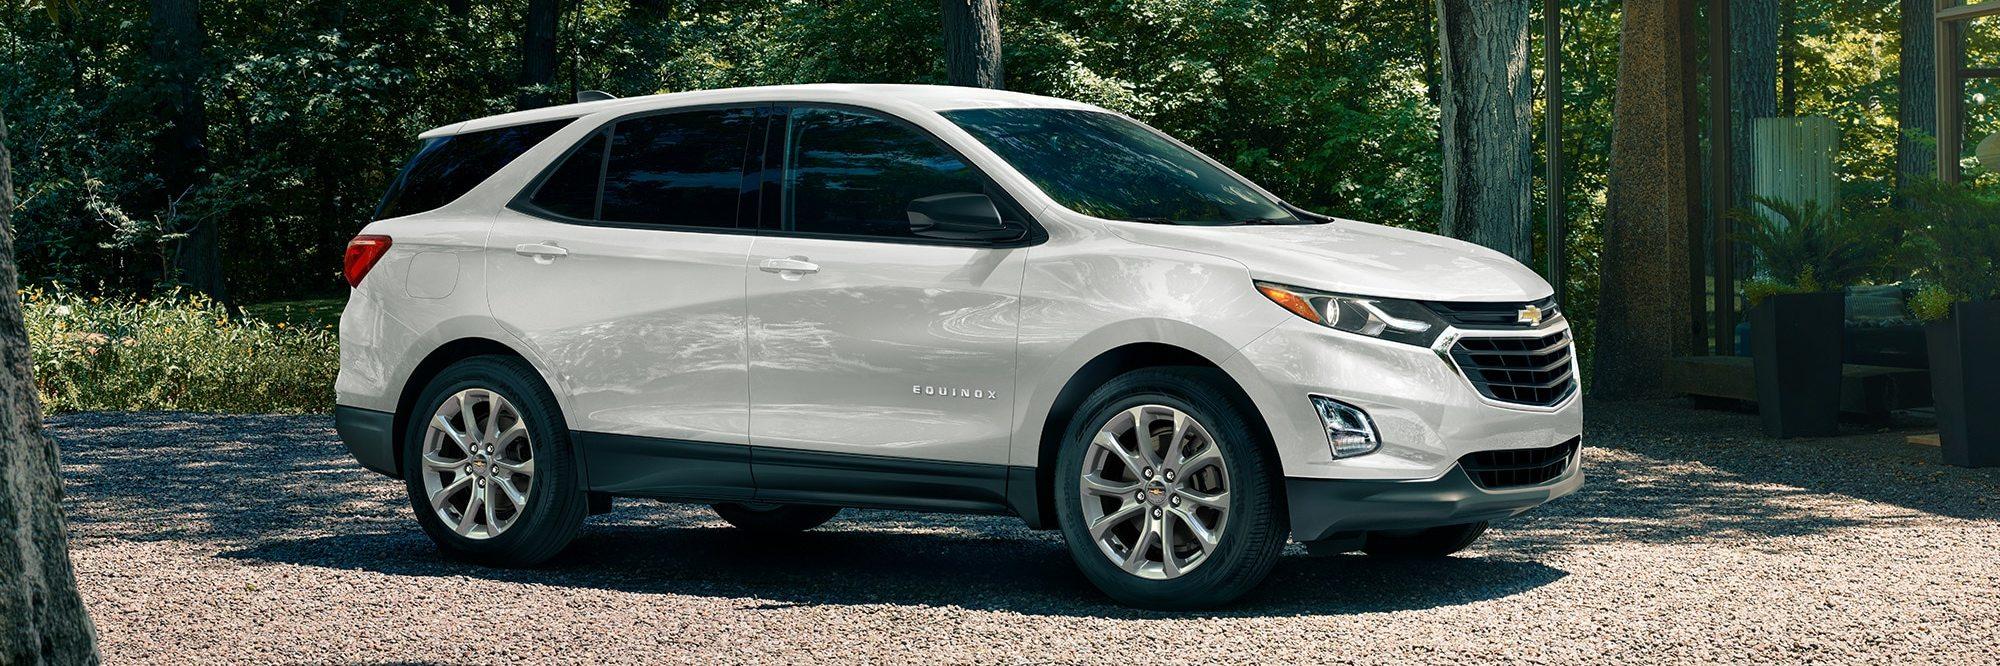 2020 Chevrolet Equinox for Sale near Flint, MI